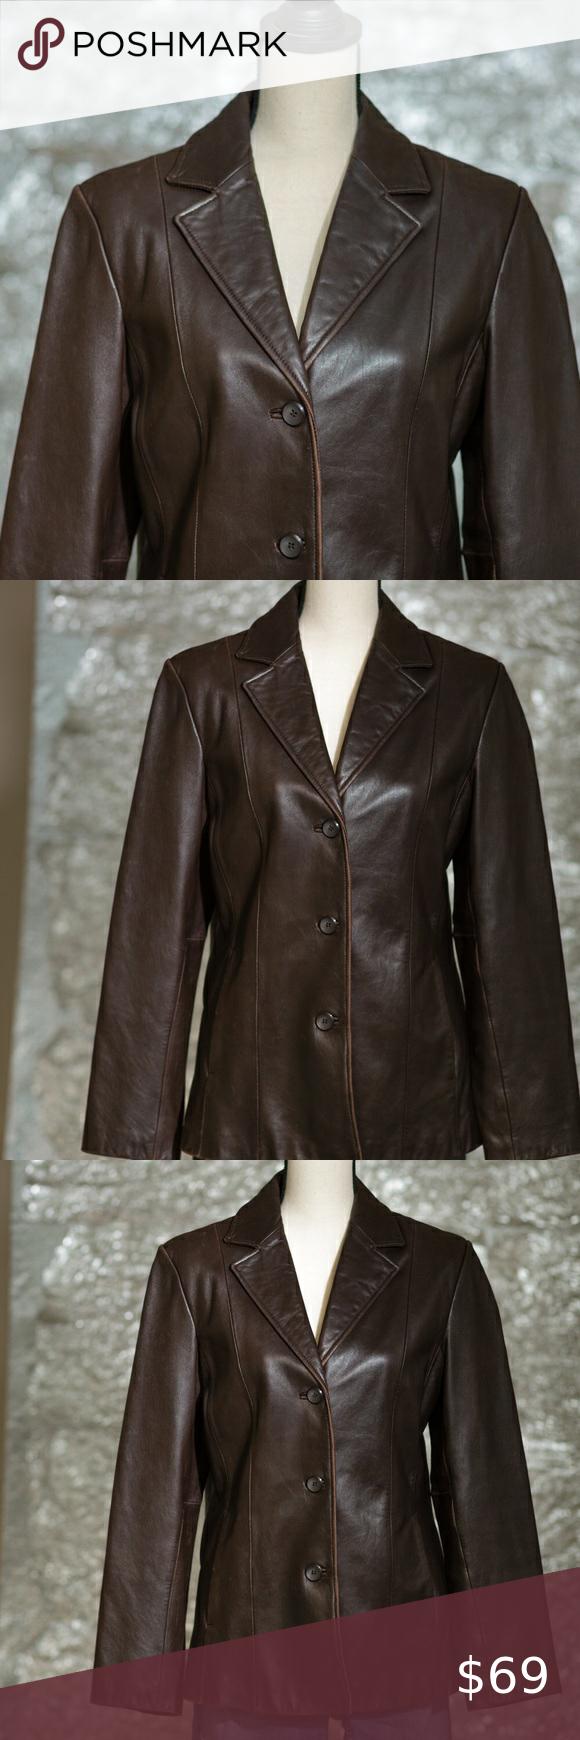 Siena Soft Chocolate Brown Leather Jacket Leather Jacket Brown Leather Jacket Jackets [ 1740 x 580 Pixel ]